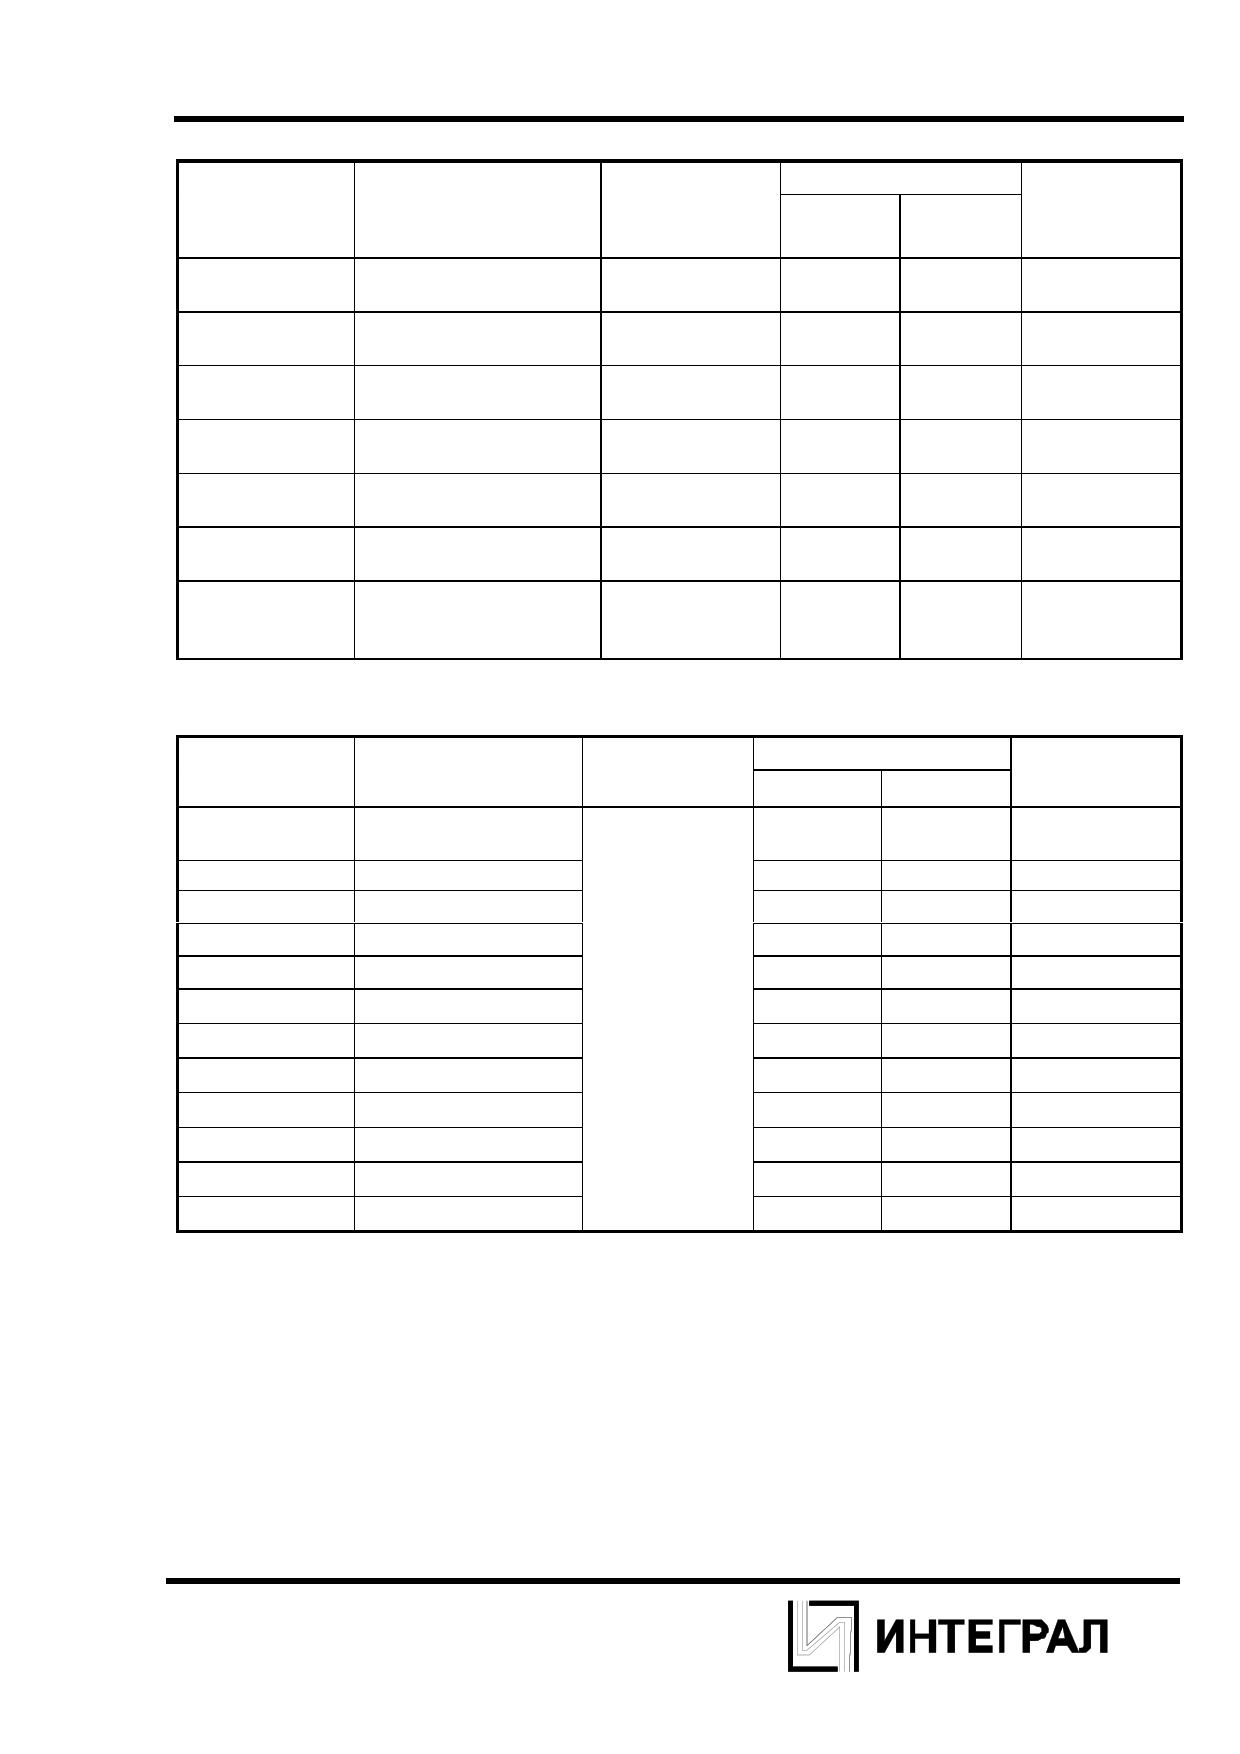 IZE4406C pdf, ピン配列